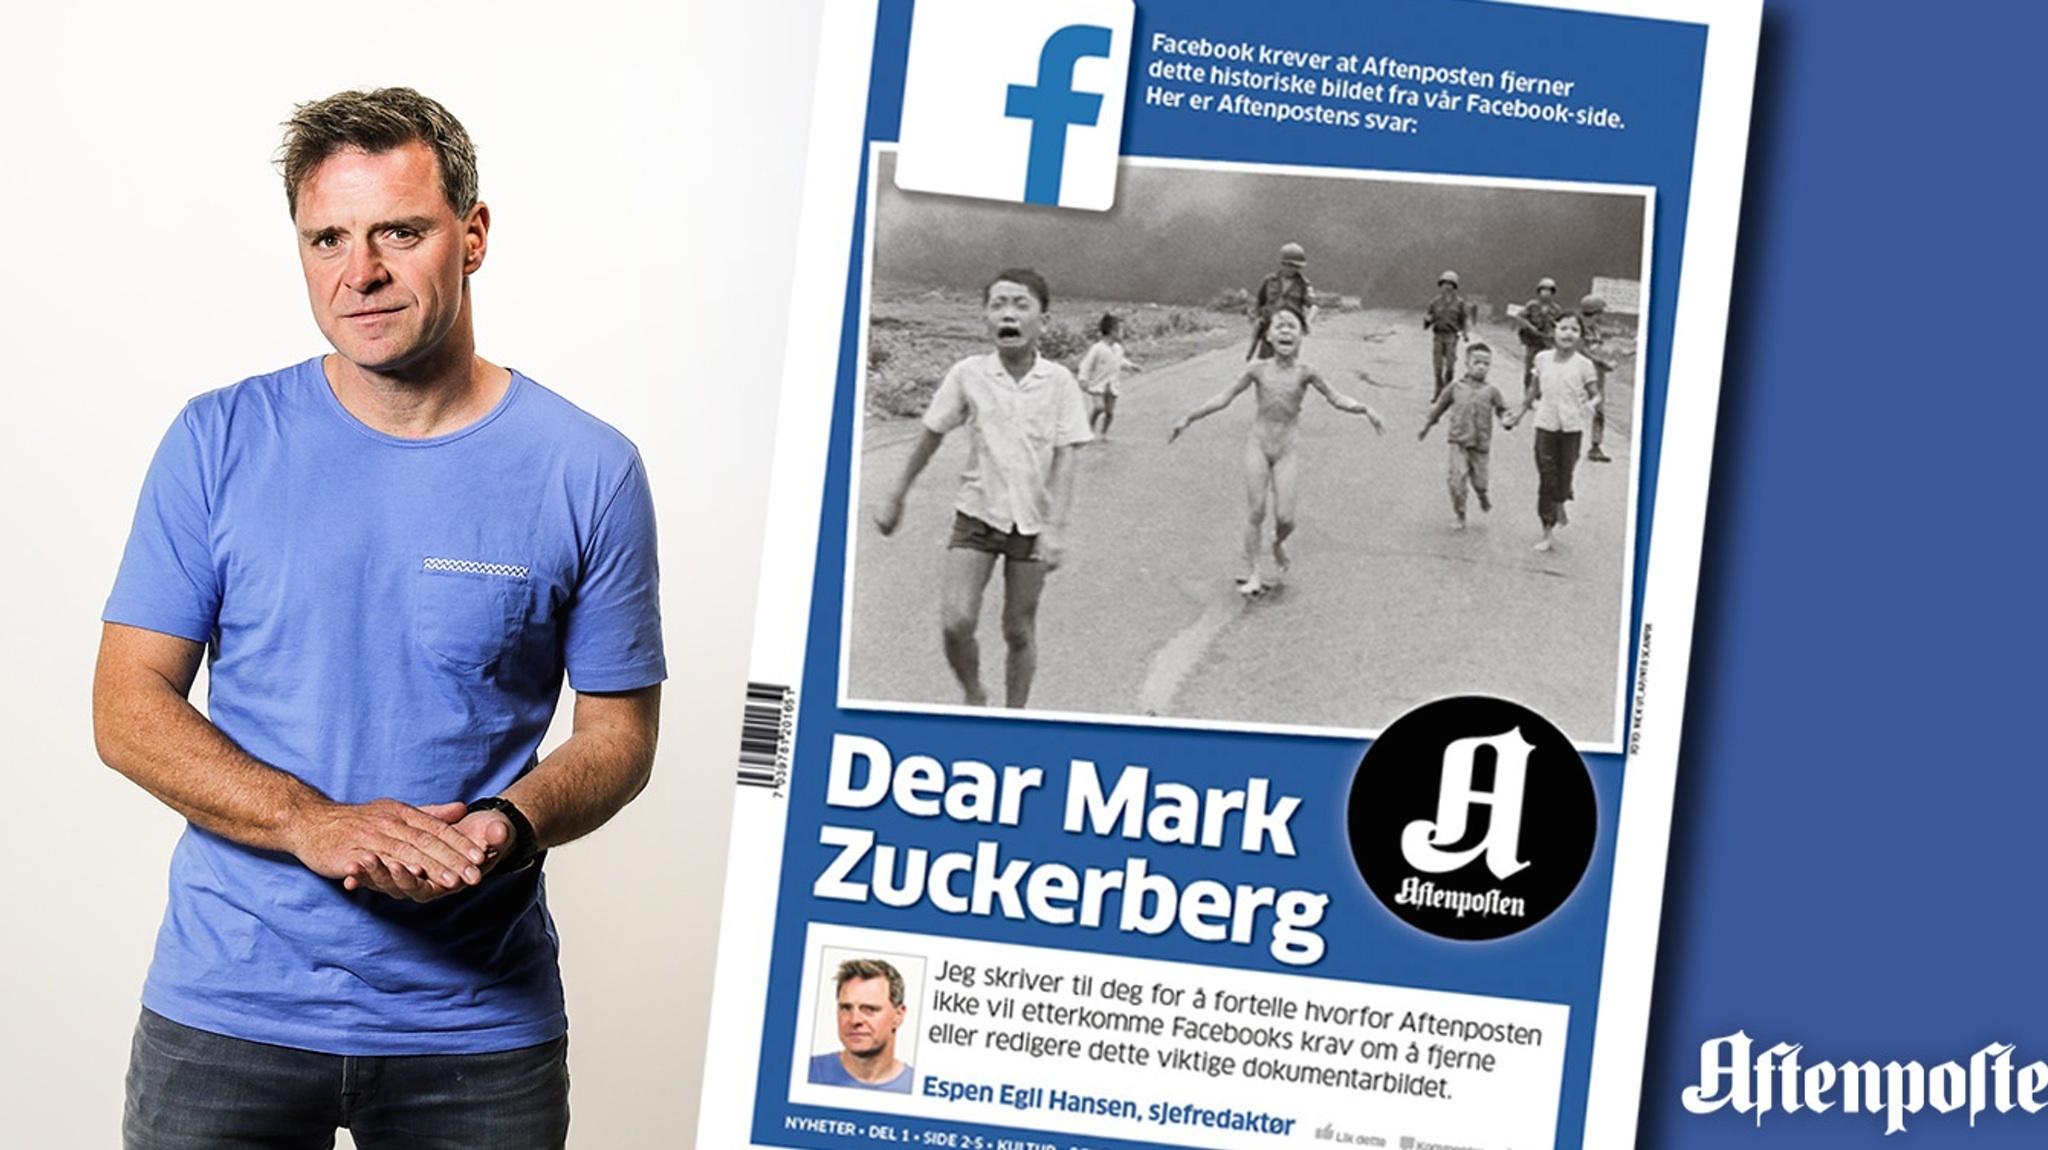 Espen Egil Hansen, the editor-in-chief of Norway's Aftenposten newspaper, addressed Facebook CEO Mark Zuckerberg in a front-page open letter on Friday. Aftenposten